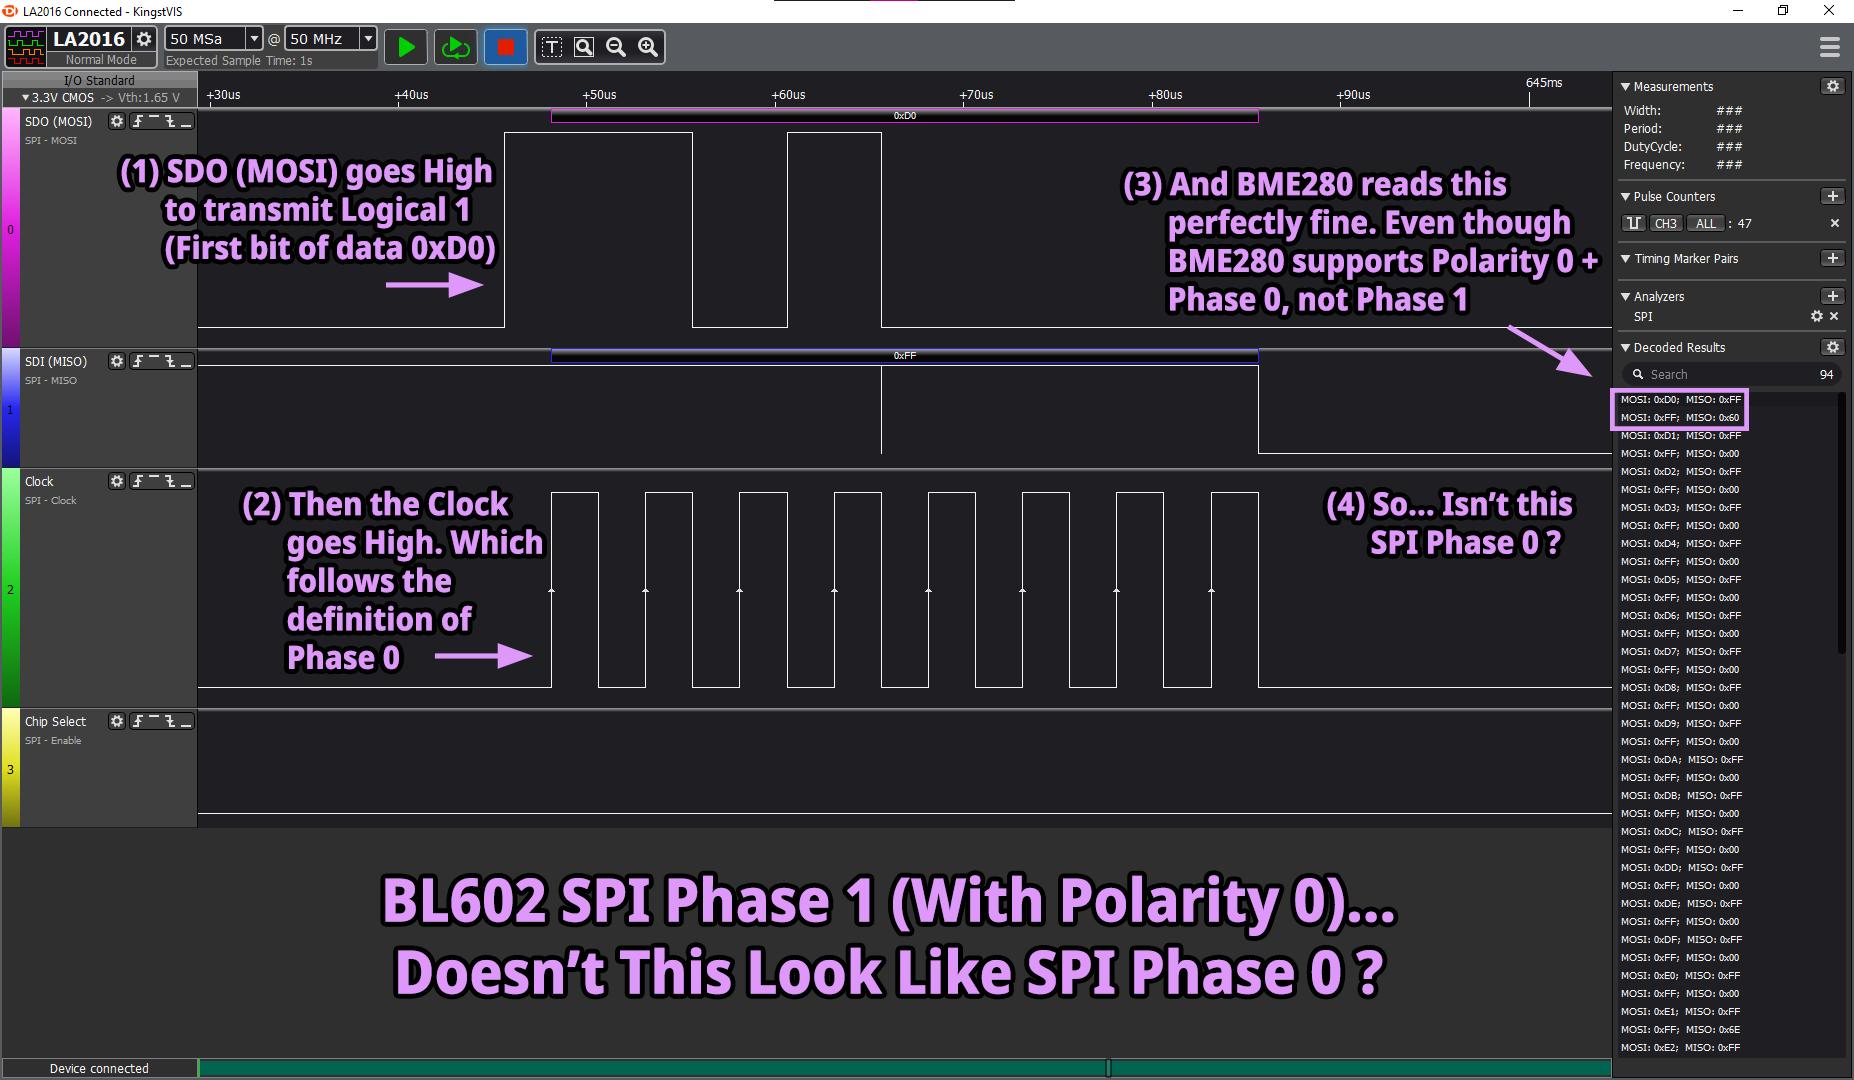 BL602 SPI Polarity 0, Phase 1